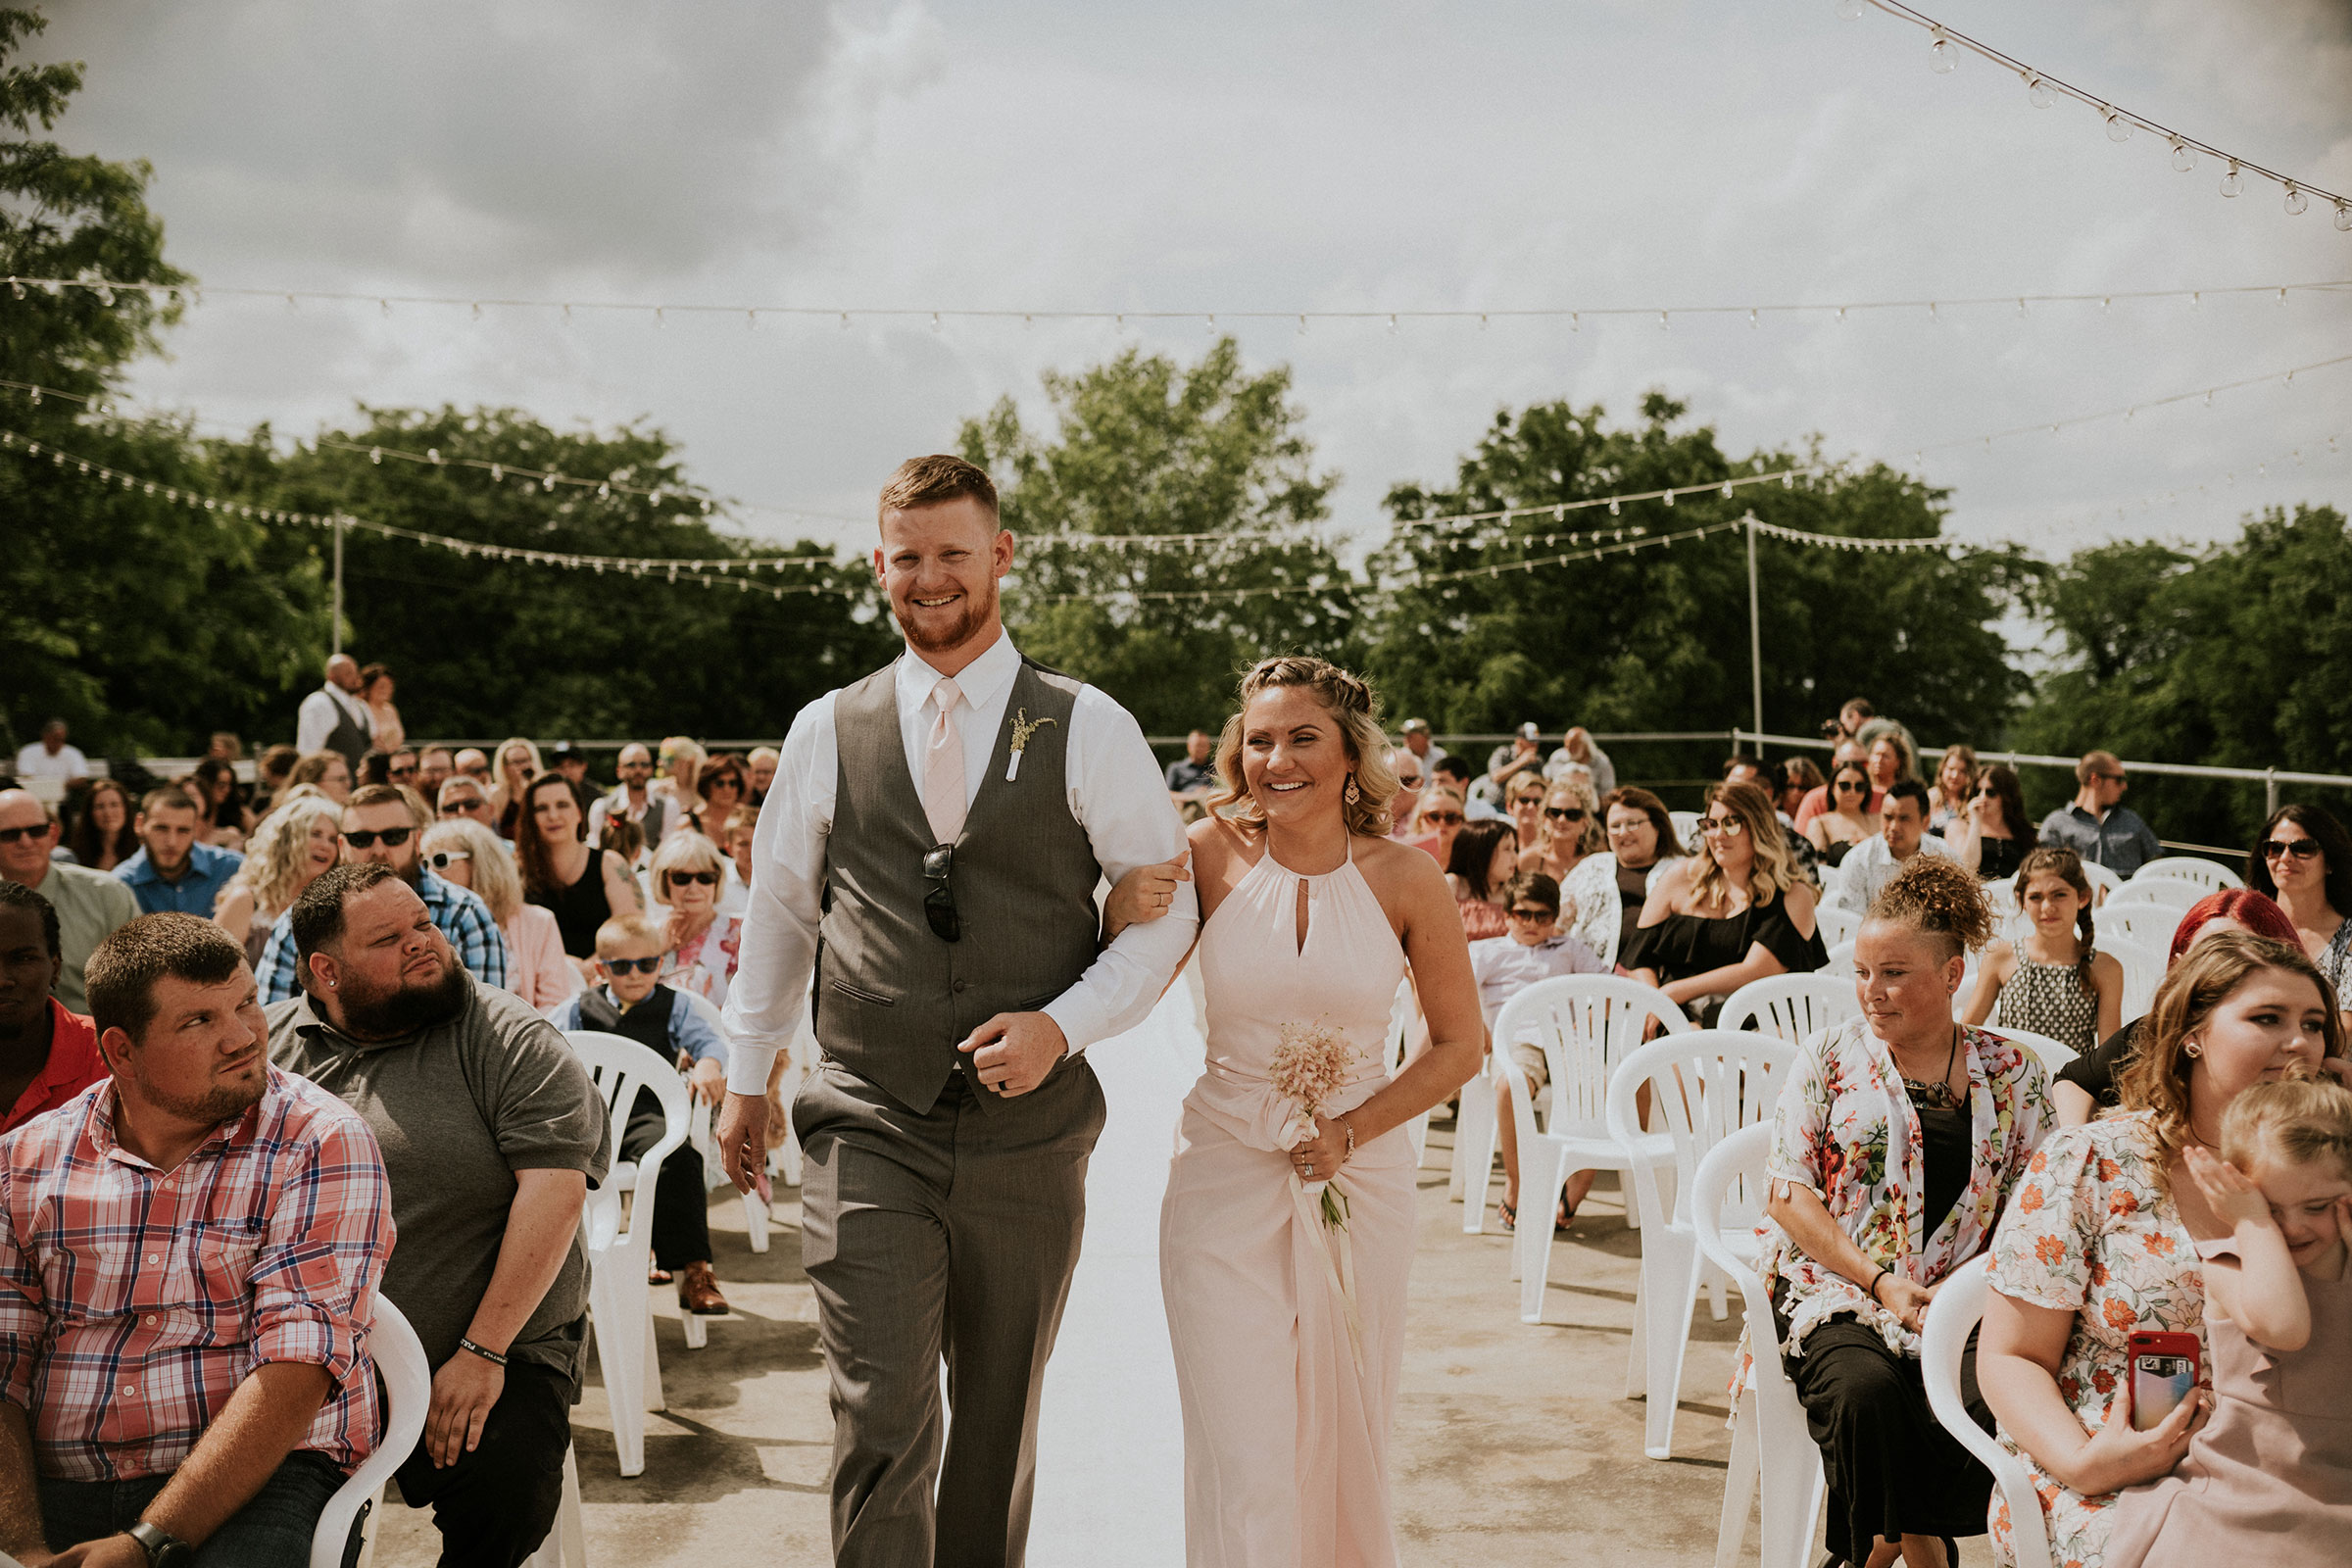 bridesmaid-and-groomsmen-walking-down-aisle-smiling-wedding-summerset-winery-indianola-iowa-raelyn-ramey-photography.jpg